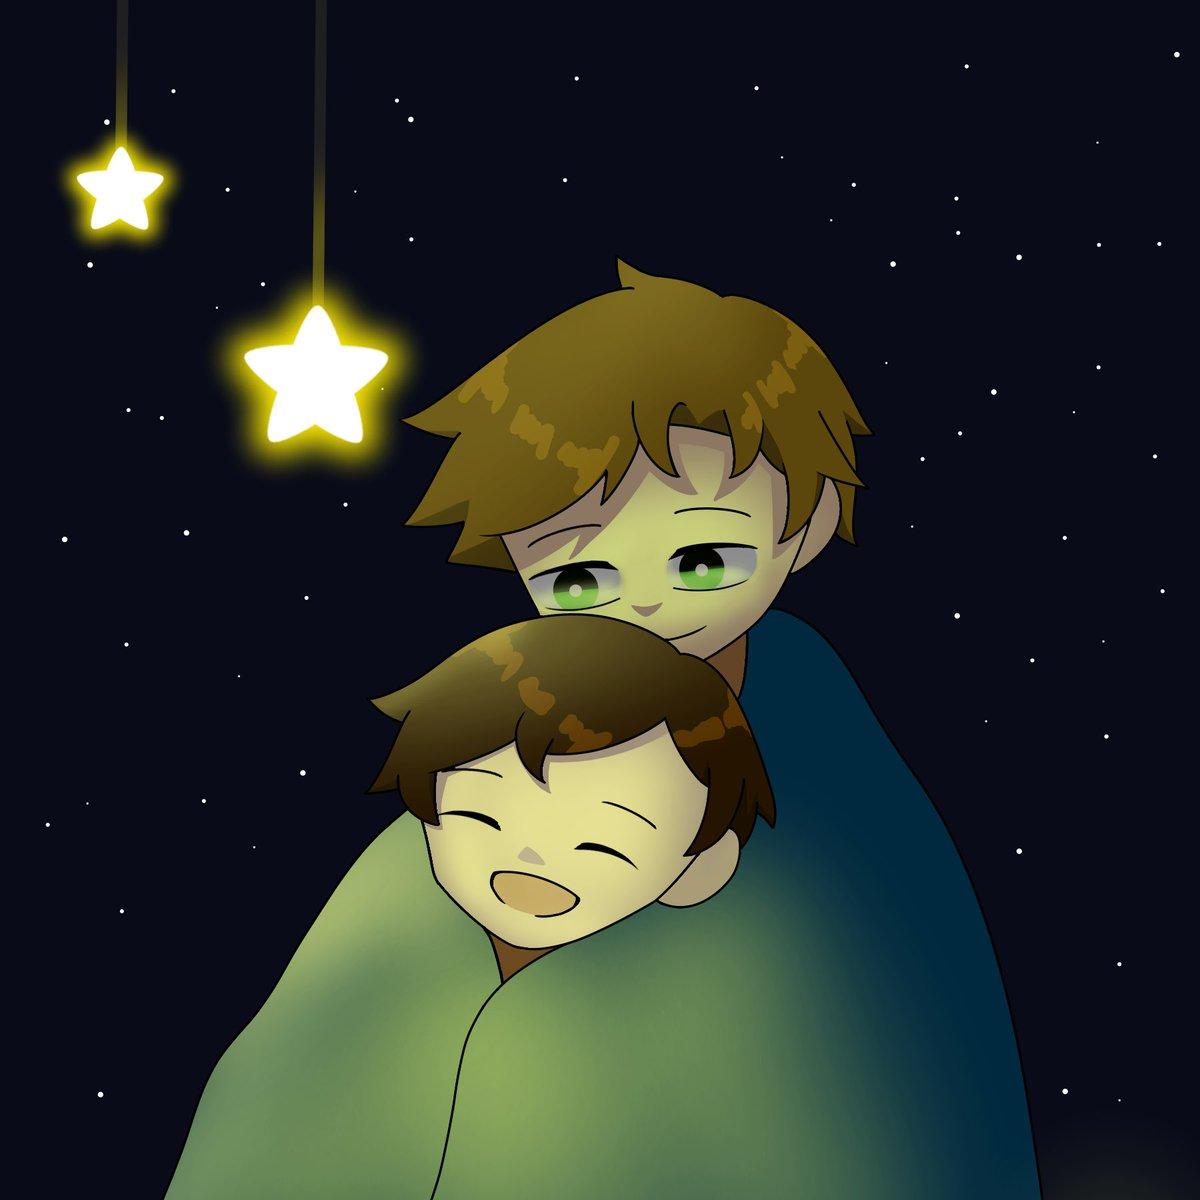 twinkle twinkle little star *・゜゚・*:.。..。.:*・'(*゚▽゚*)'・*:.。. .。.:*・゜゚・*☆  #georgenotfoundfantart #dreamfanart #dreamnotfoundfanart #dreamnotfound